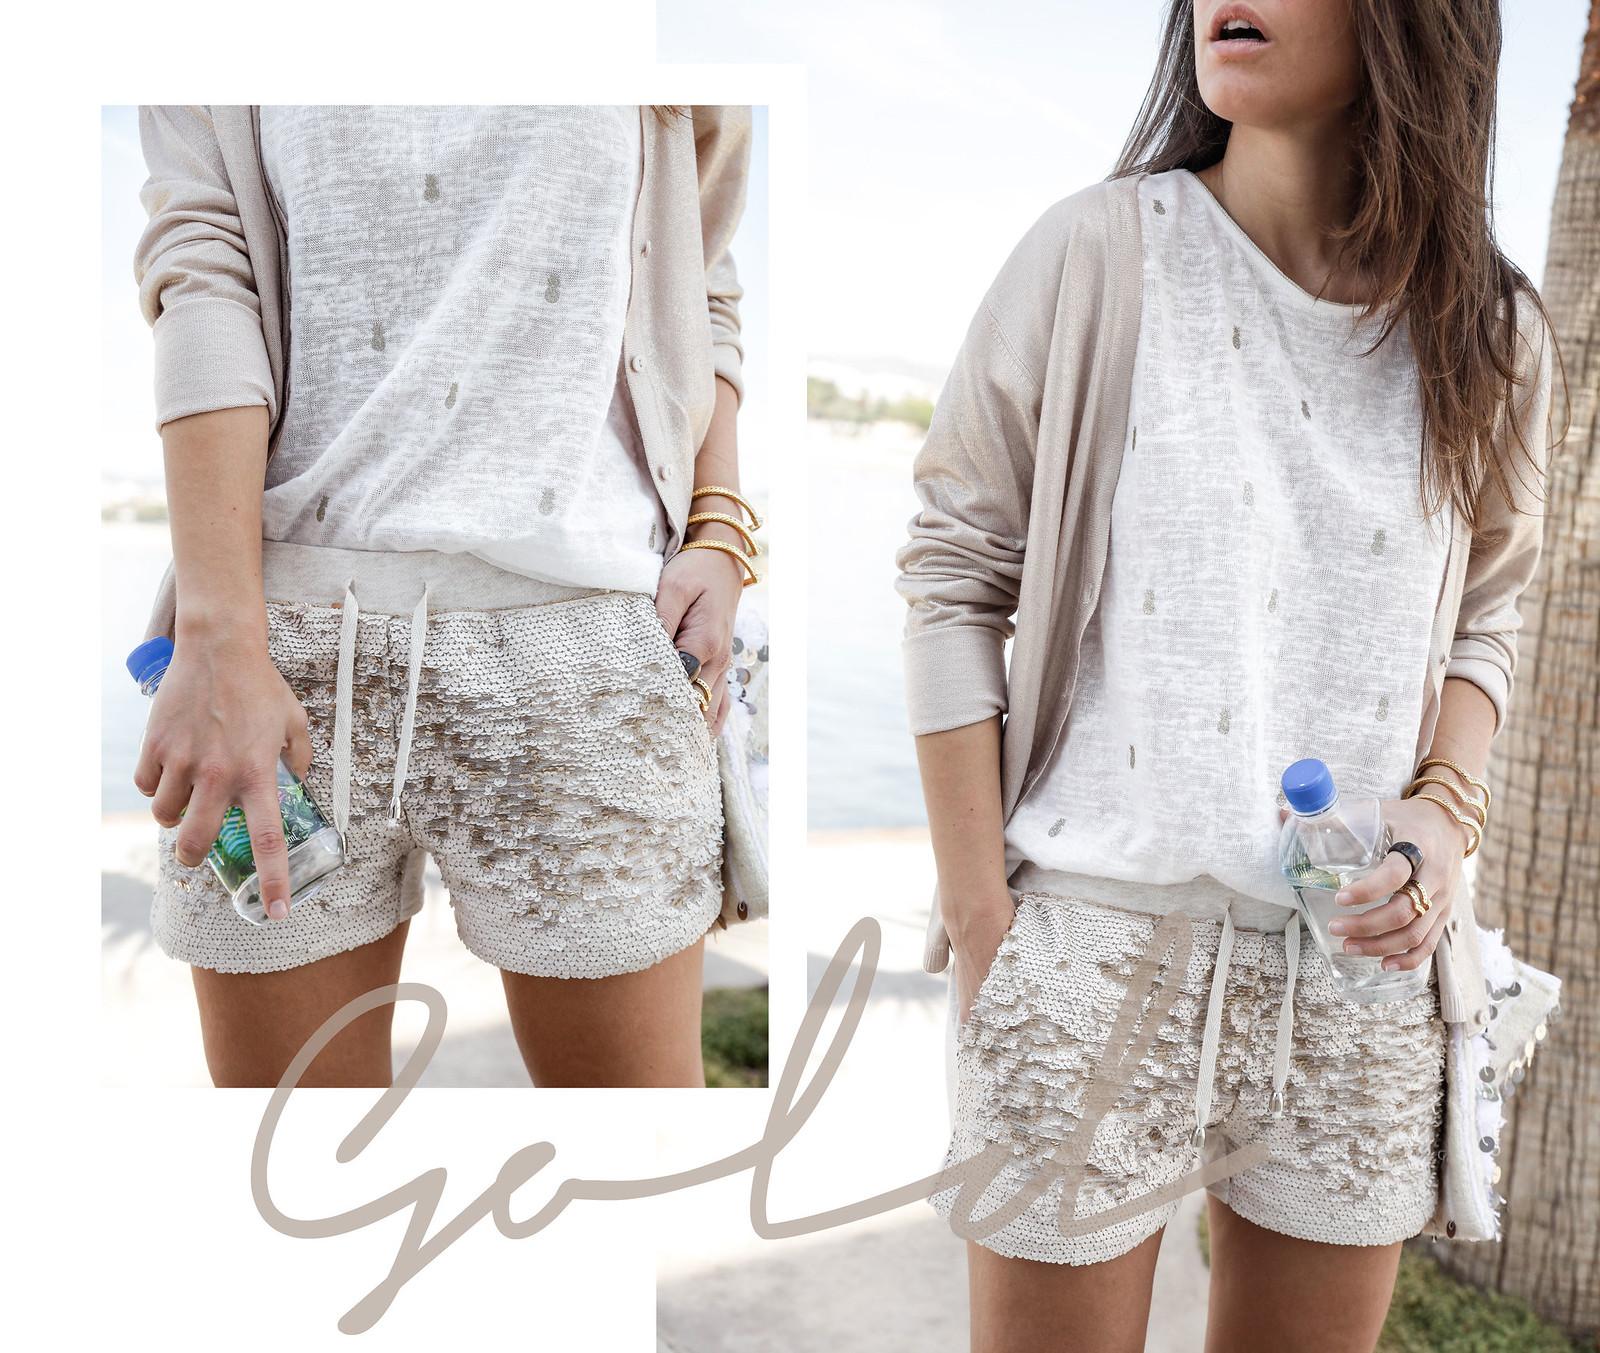 03_Shorts_lentejuelas_dorados_outfit_lelyjane_gold_shorts_theguetsgirl_laura_santolaria_influencer_barcelona_style